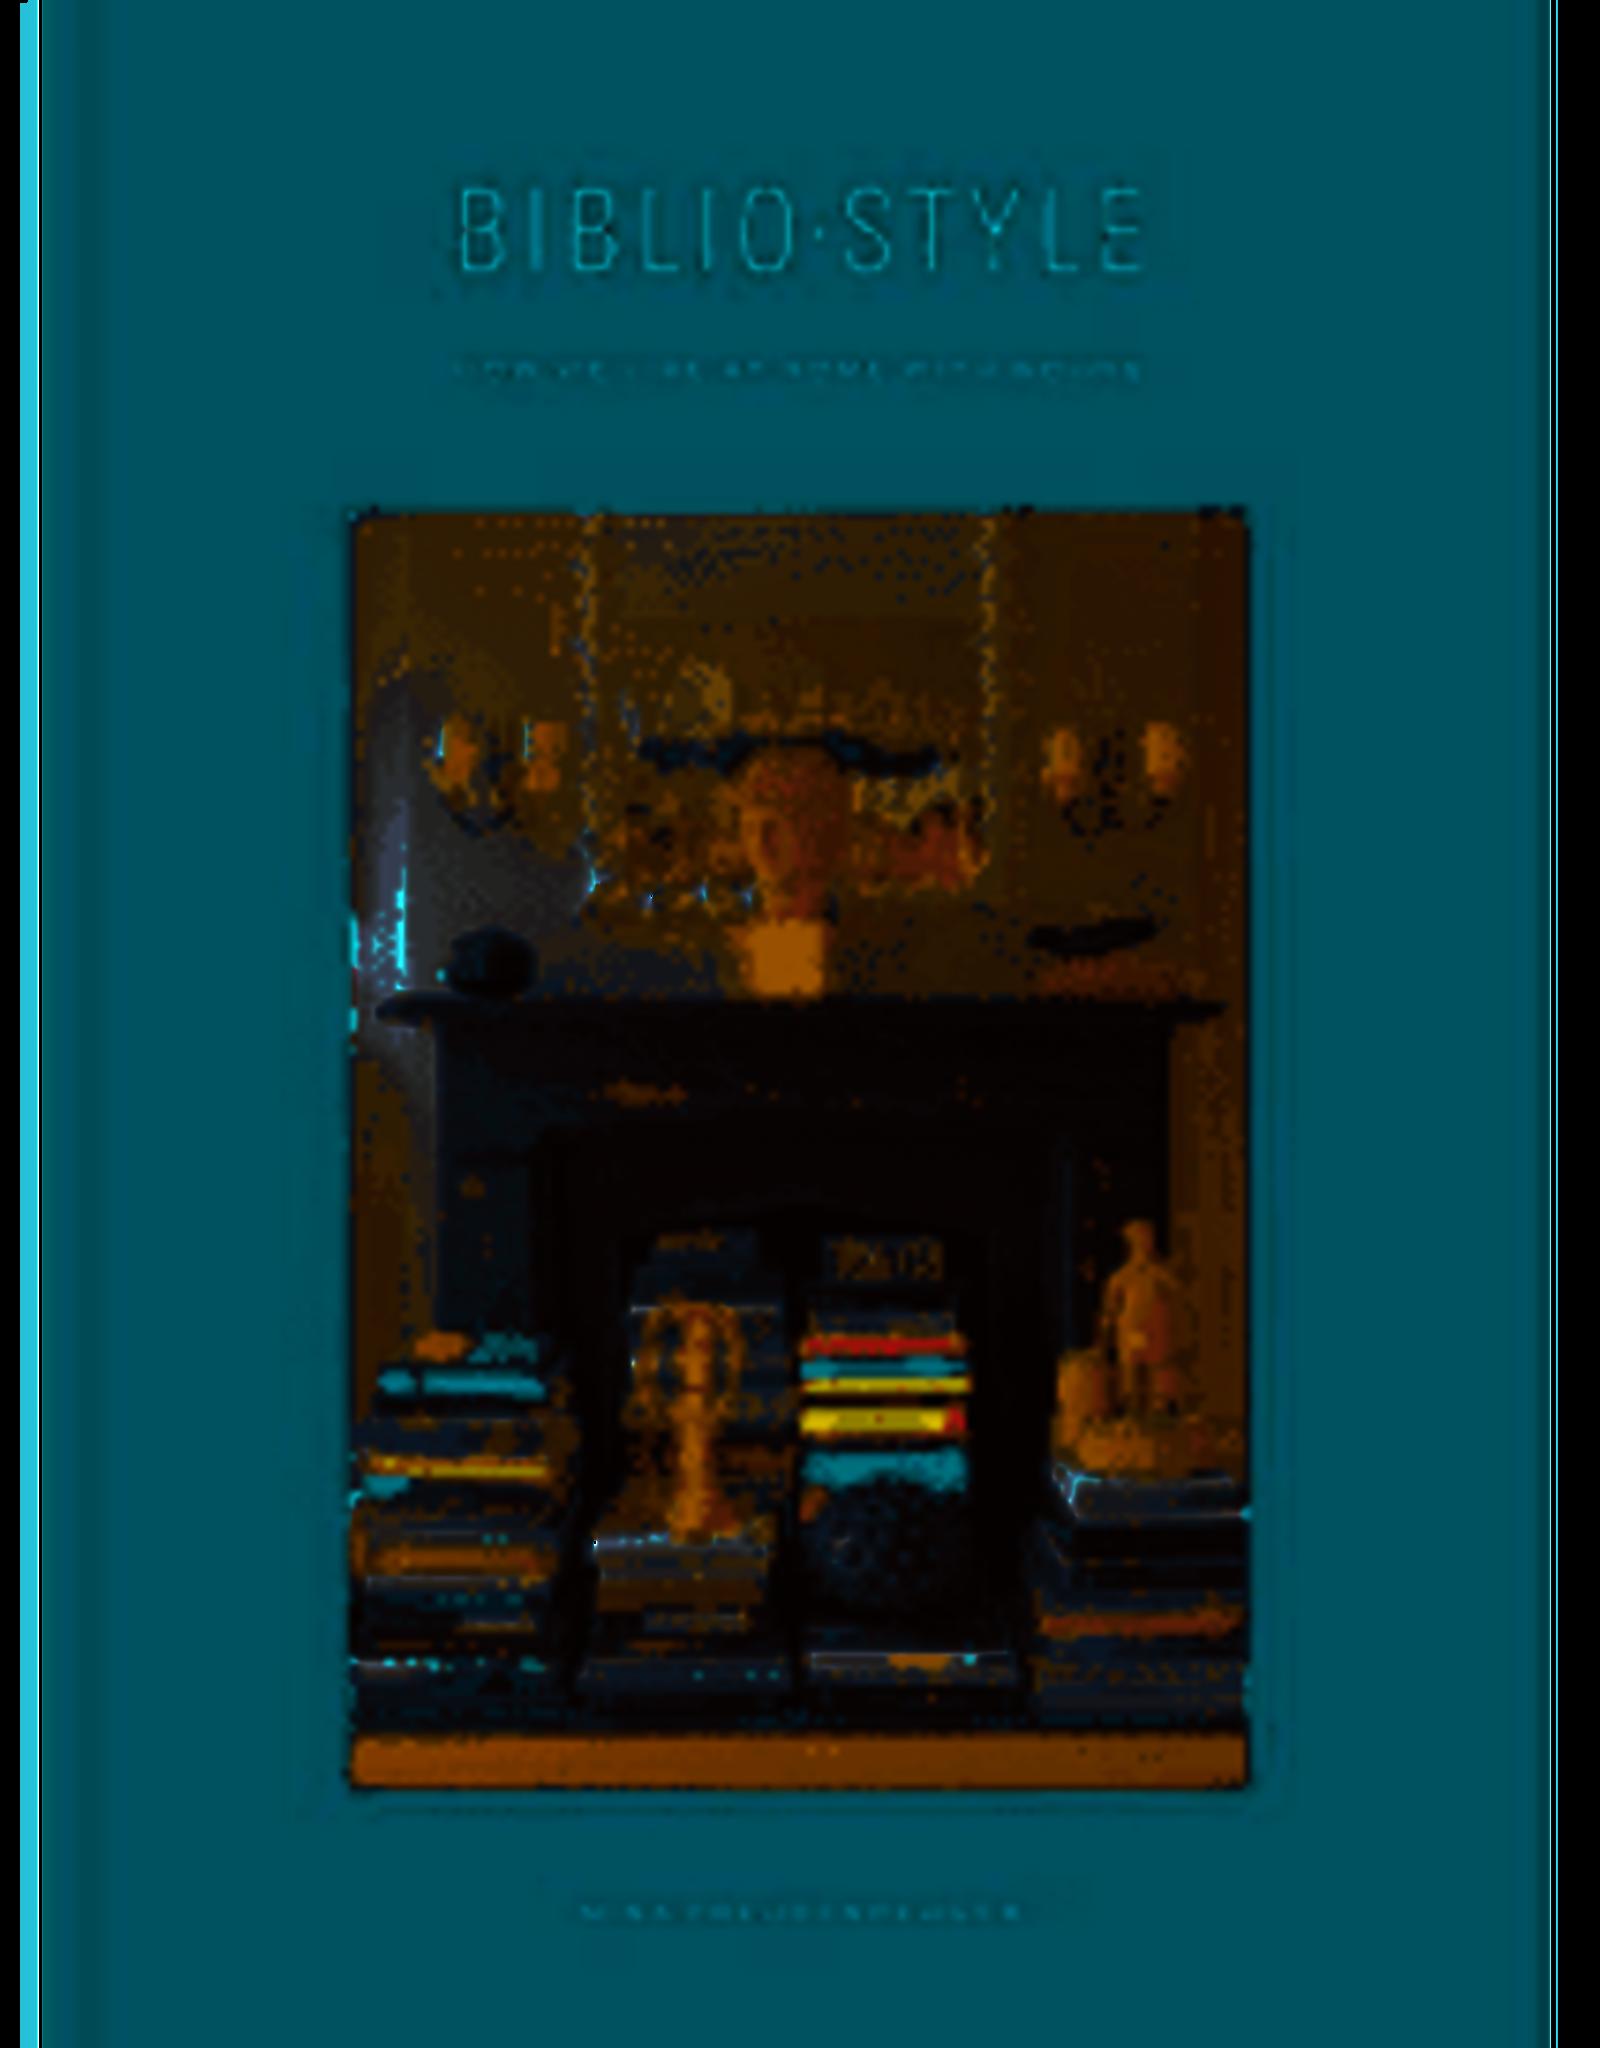 Penguin Random House Bibliostyle